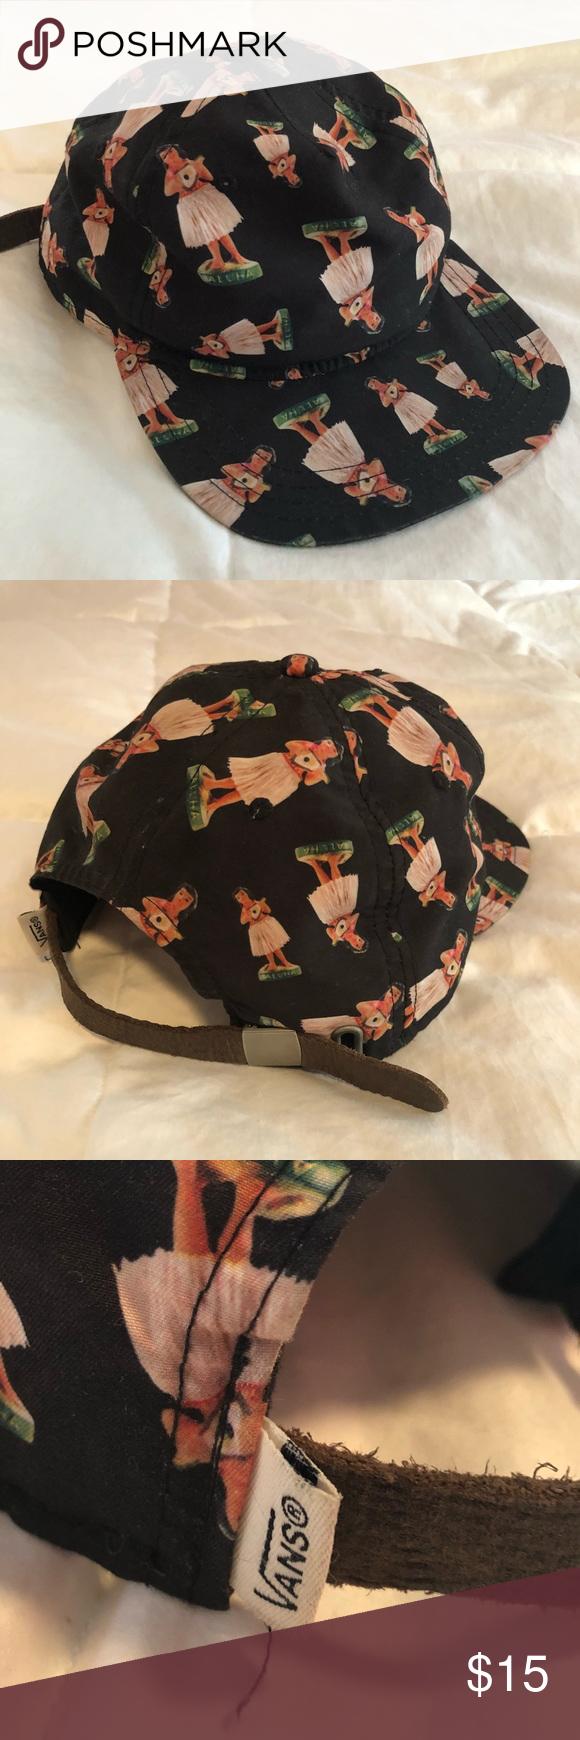 ... uk availability d0908 22535 Vans hula girl hat Hula Vans Accessories  Hats ... caf4a66f54a